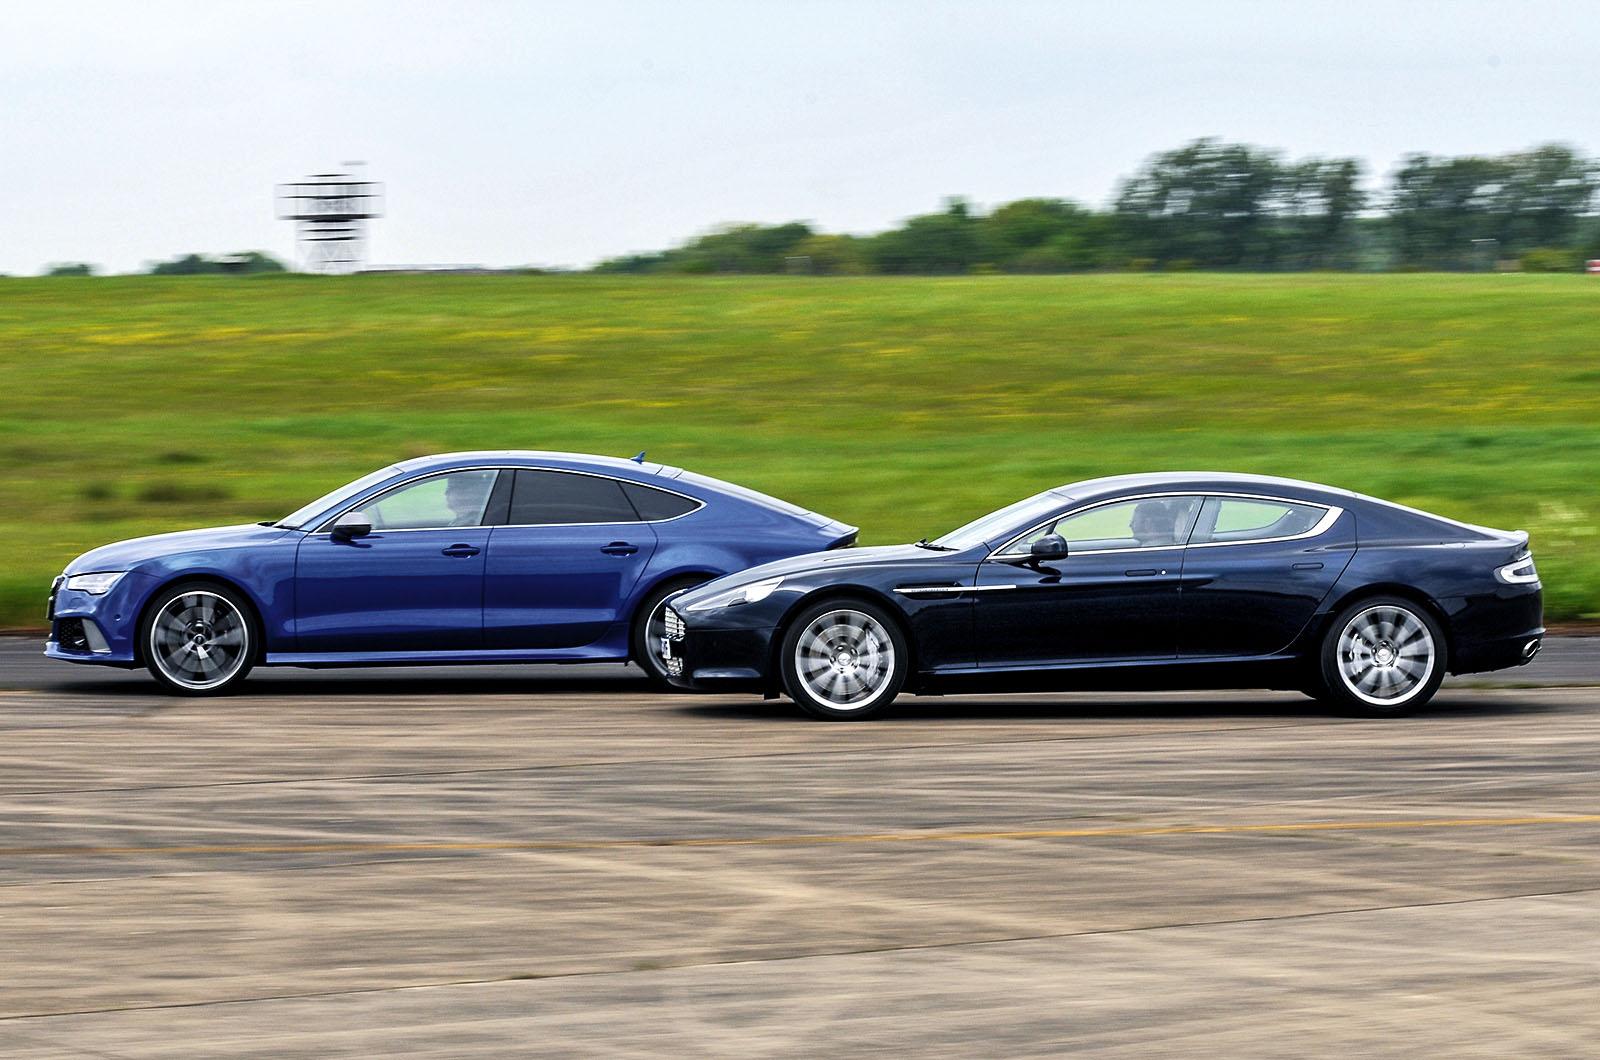 New Audi Rs7 Performance Vs Used Aston Martin Rapide Luxury